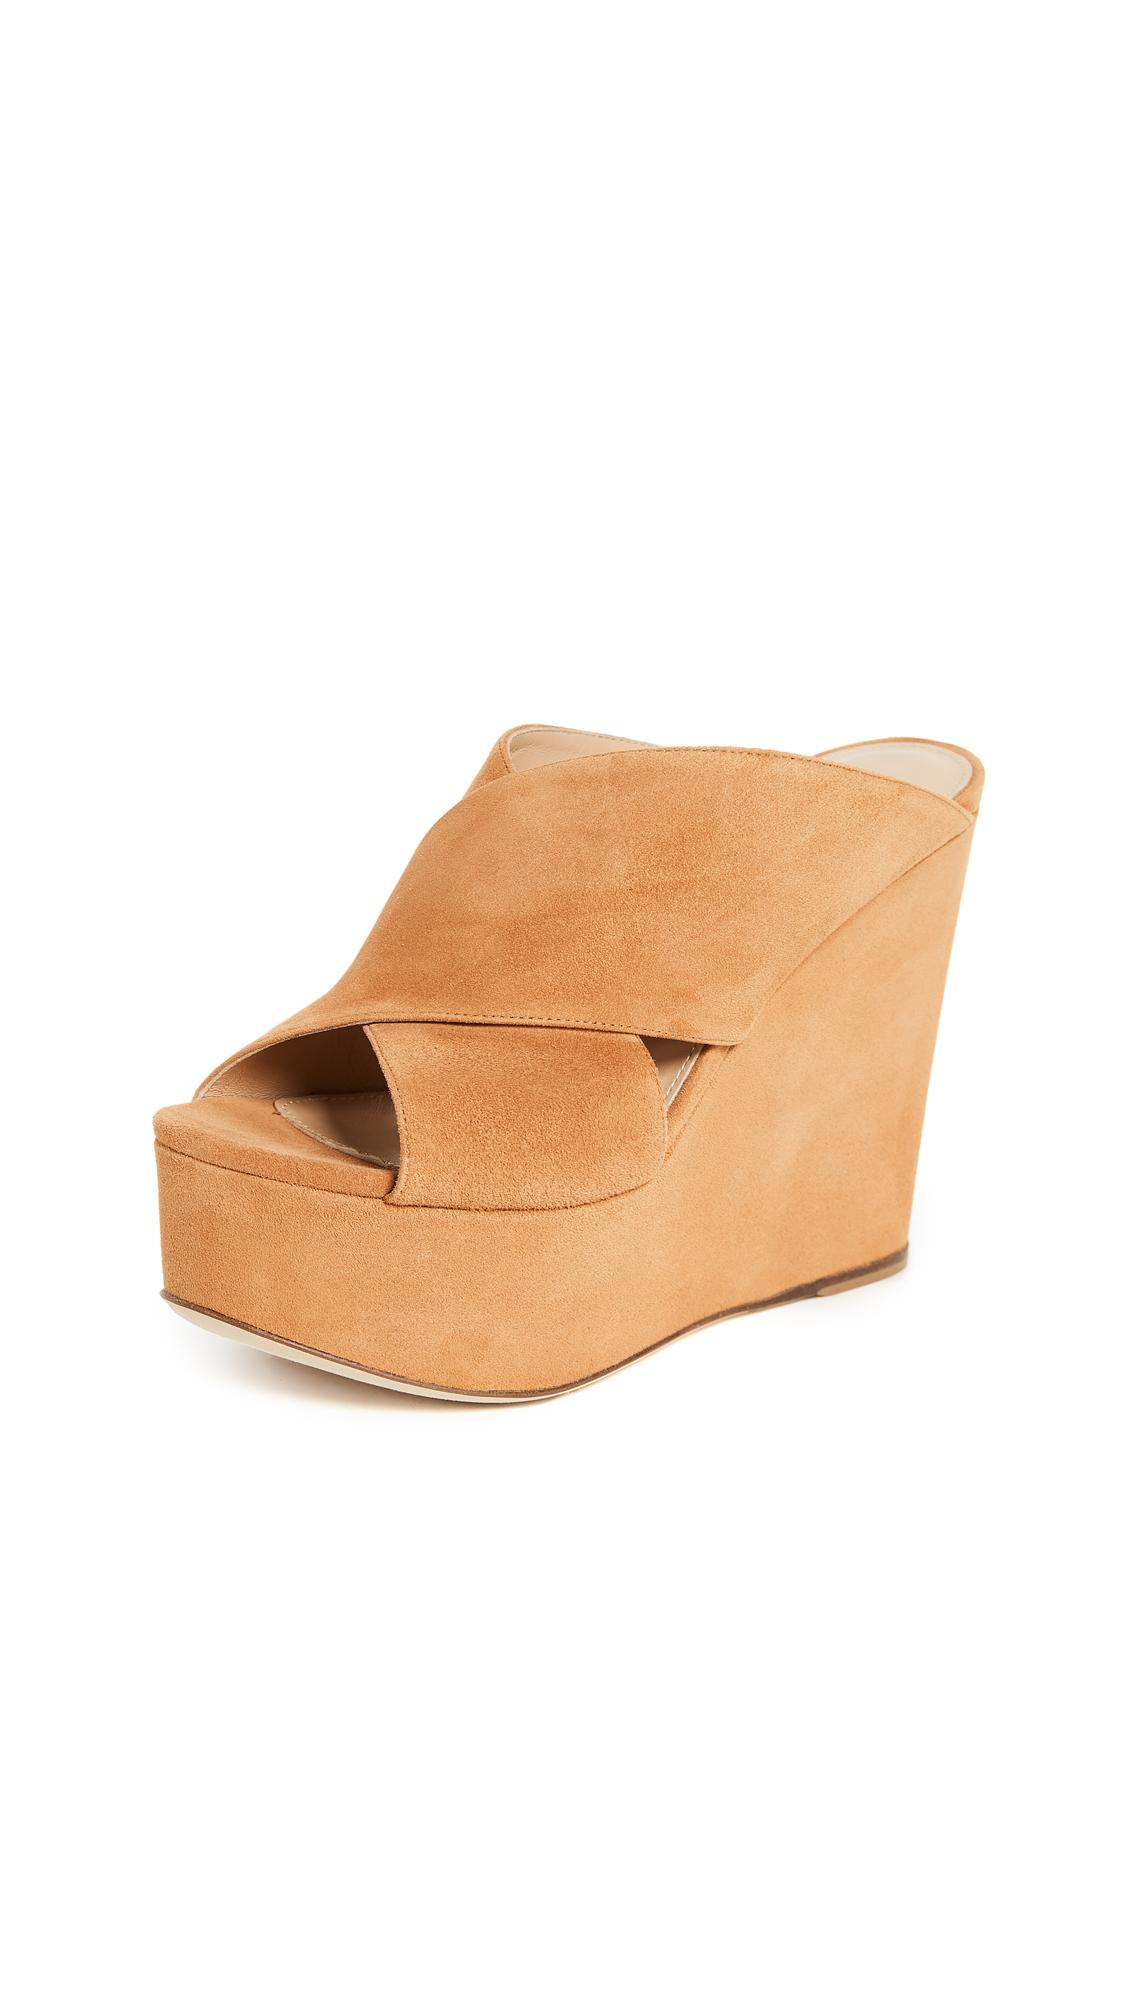 Sergio Rossi Alma Platform Sandals - Luggage